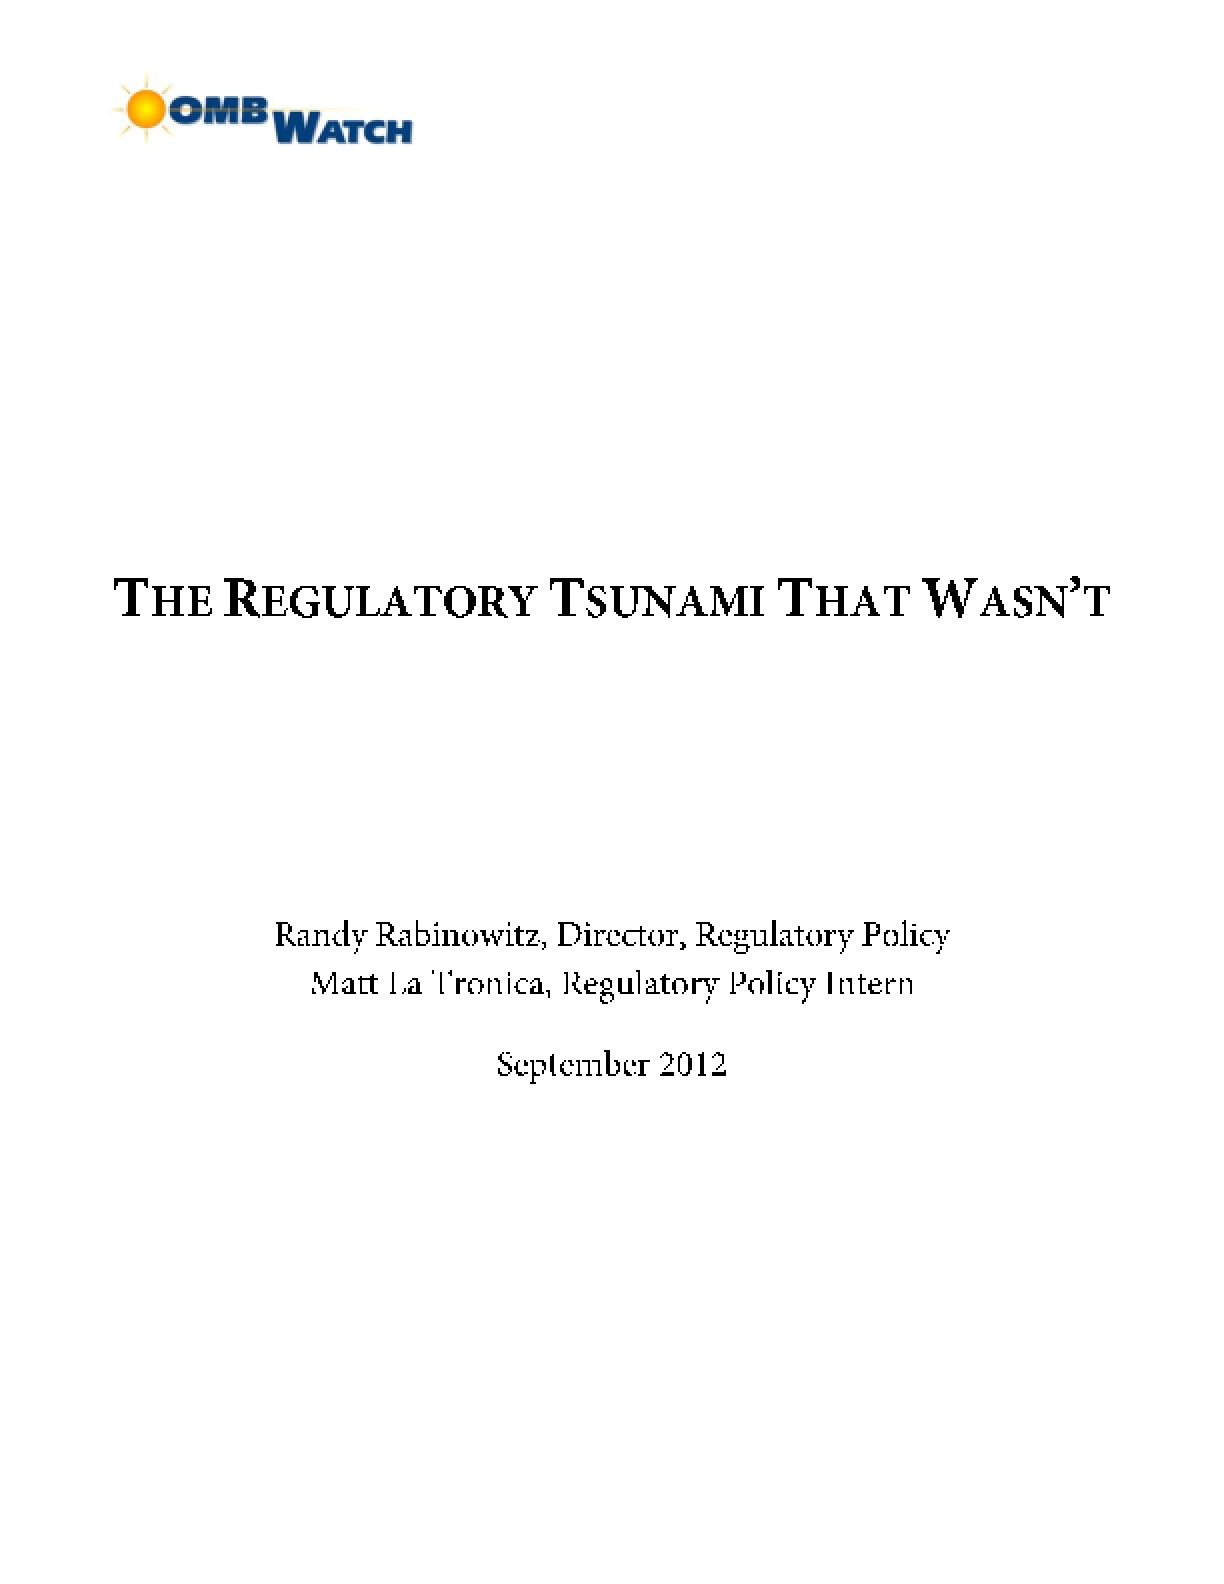 The Regulatory Tsunami That Wasn't